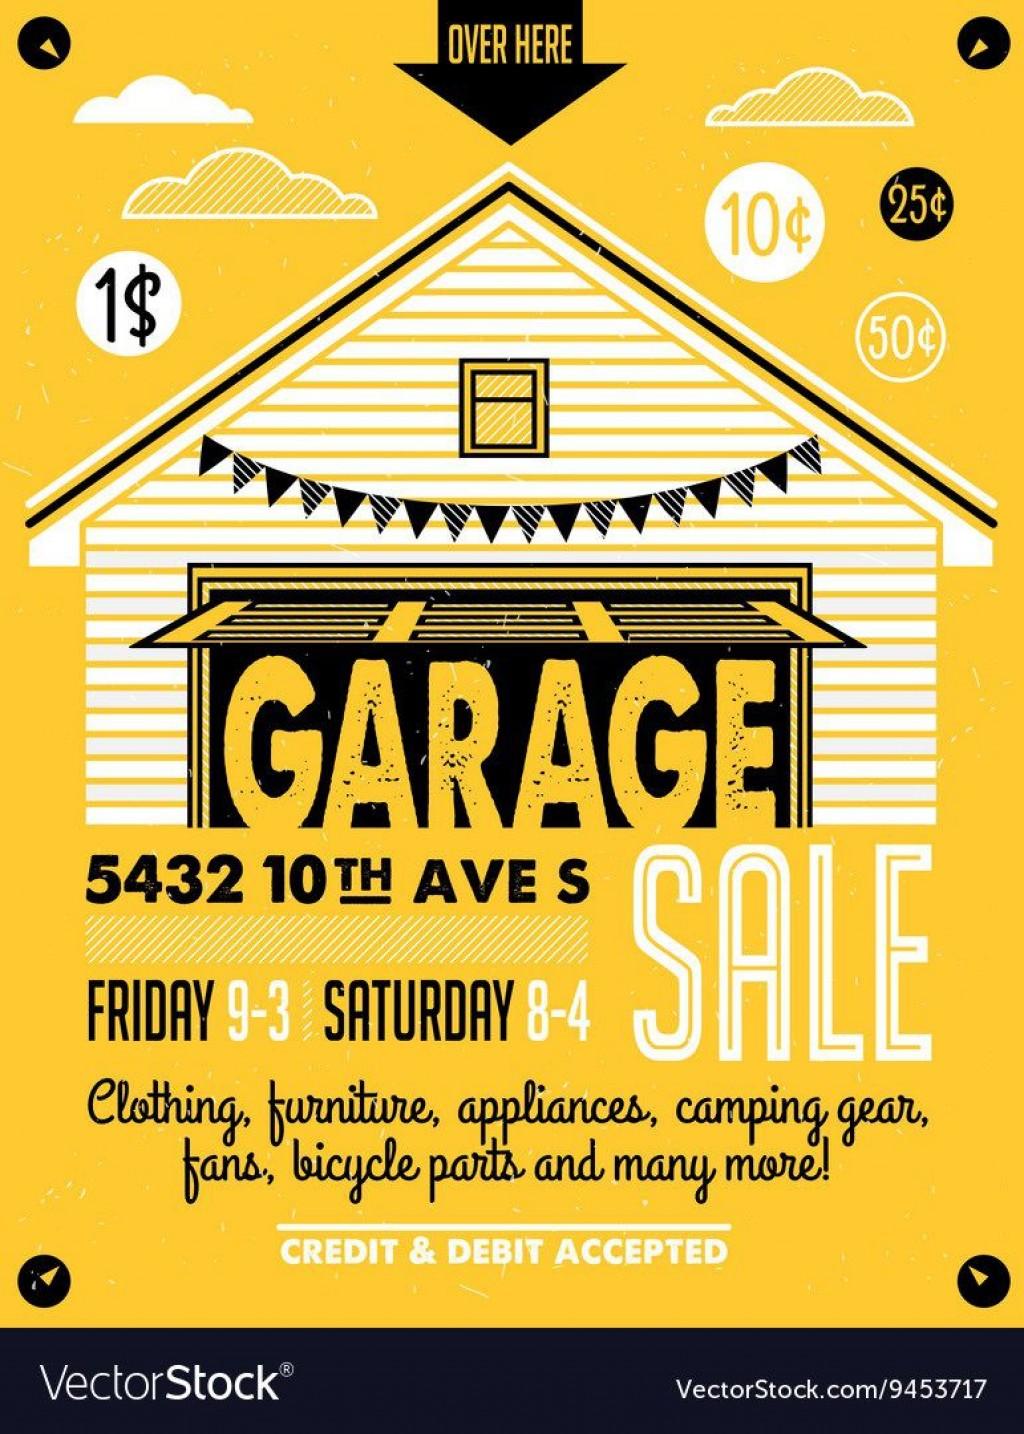 010 Impressive Garage Sale Flyer Template Free Concept  Community Neighborhood YardLarge